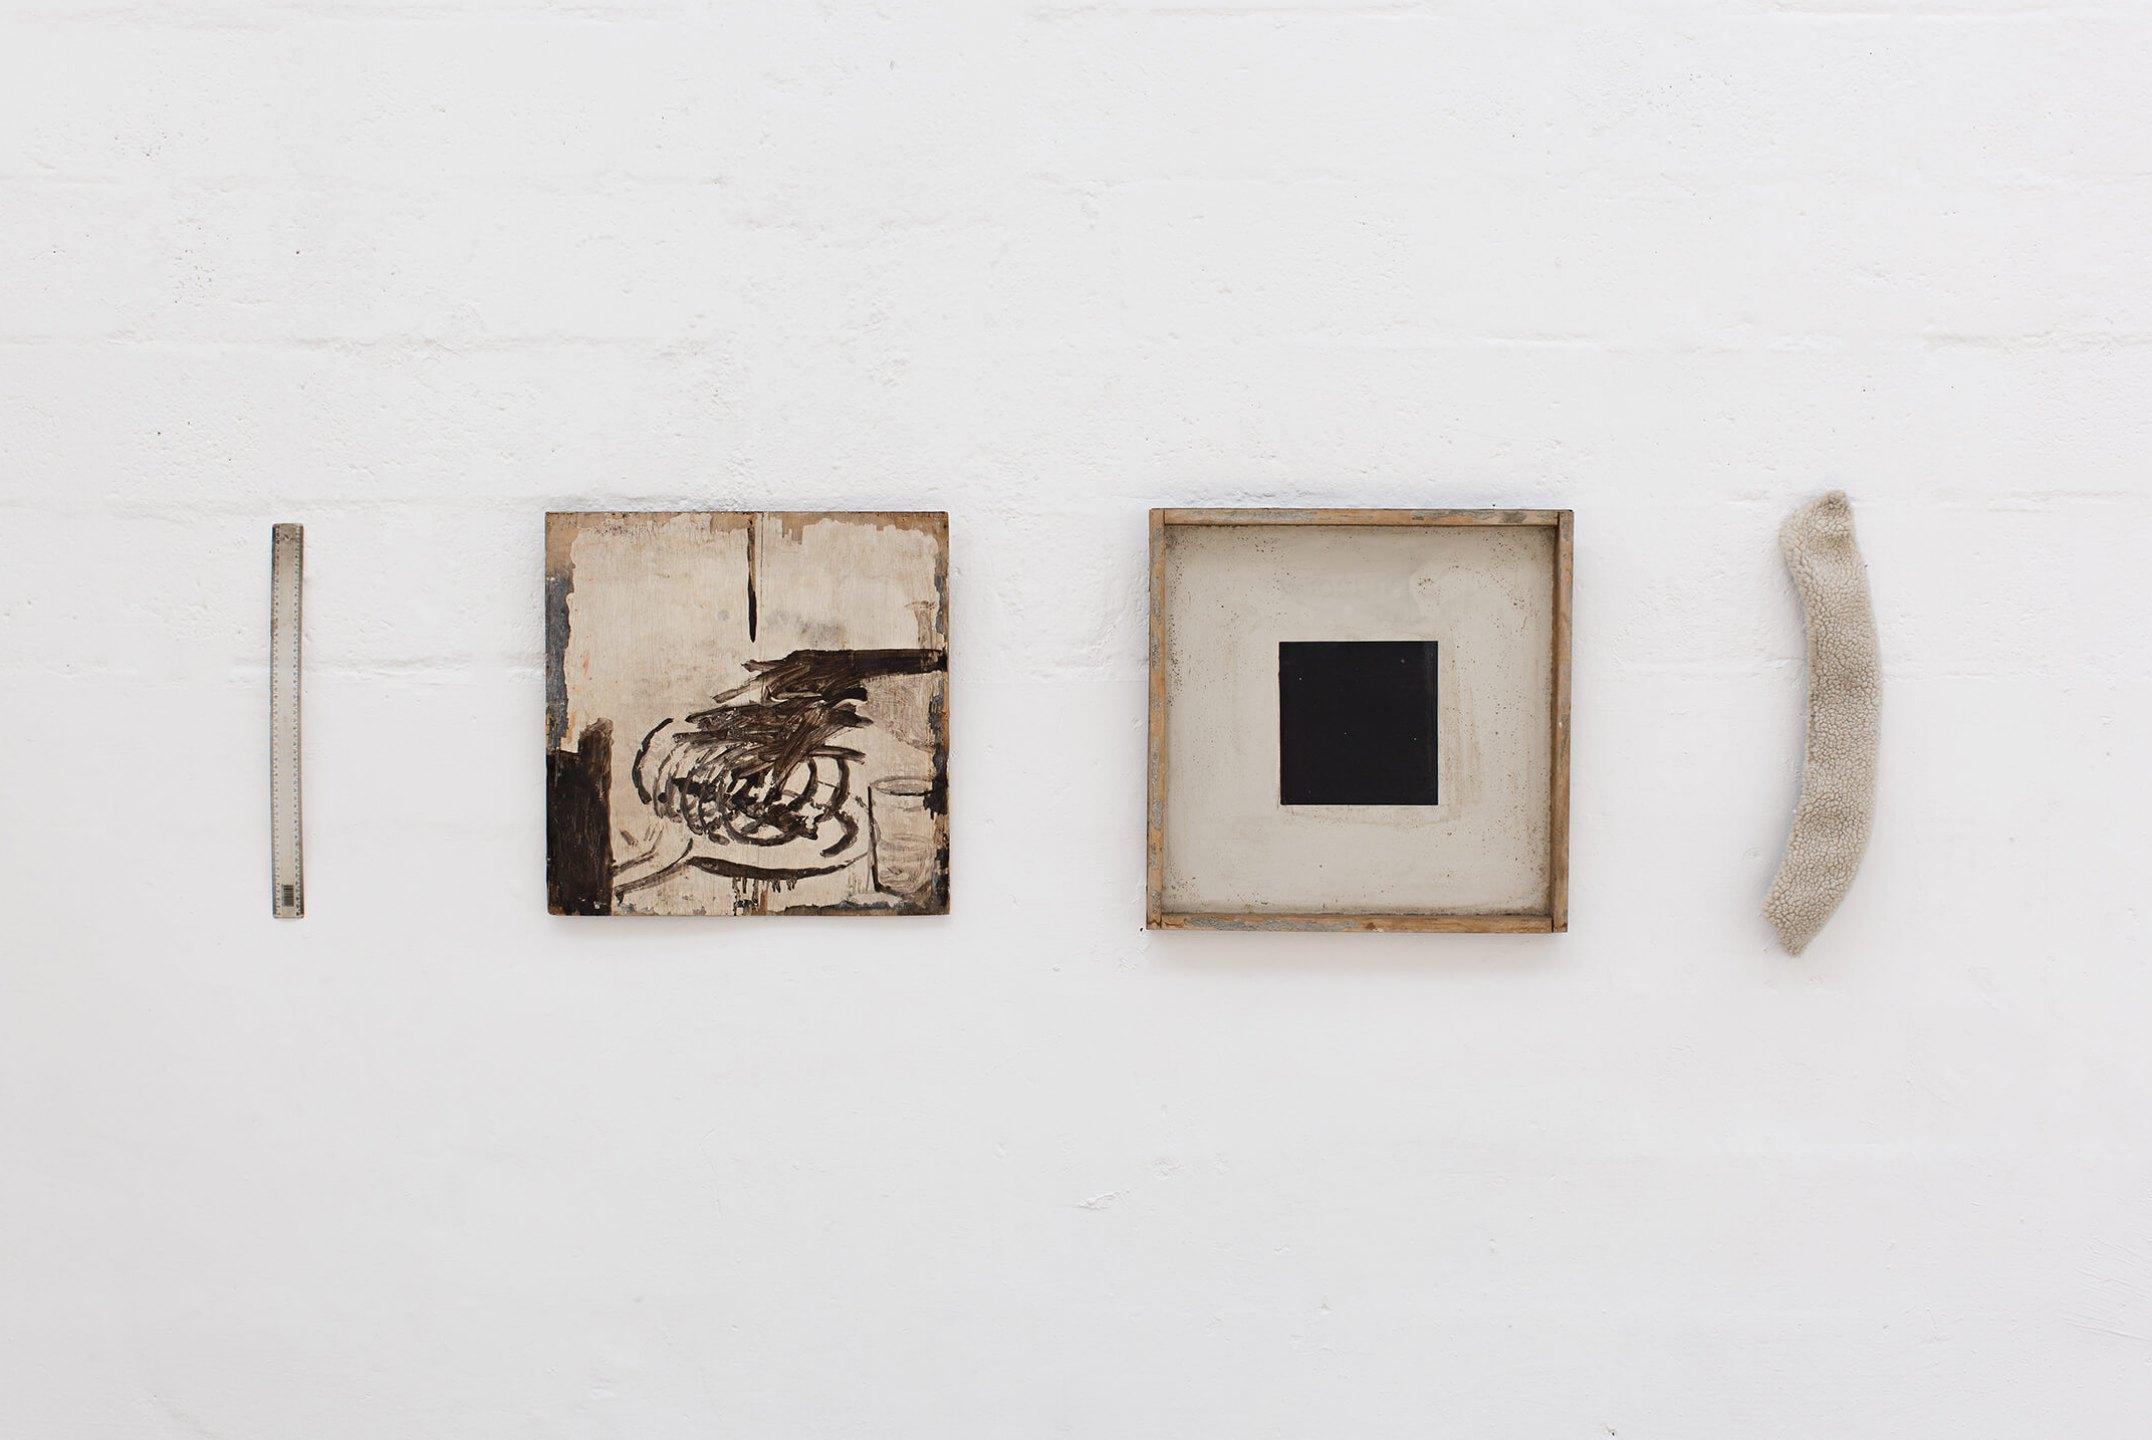 Deyson Gilbert,<em>untitled</em>,2004, acrylic on wood, plastic and artificial wool, 64 × 193 × 6 cm - Mendes Wood DM